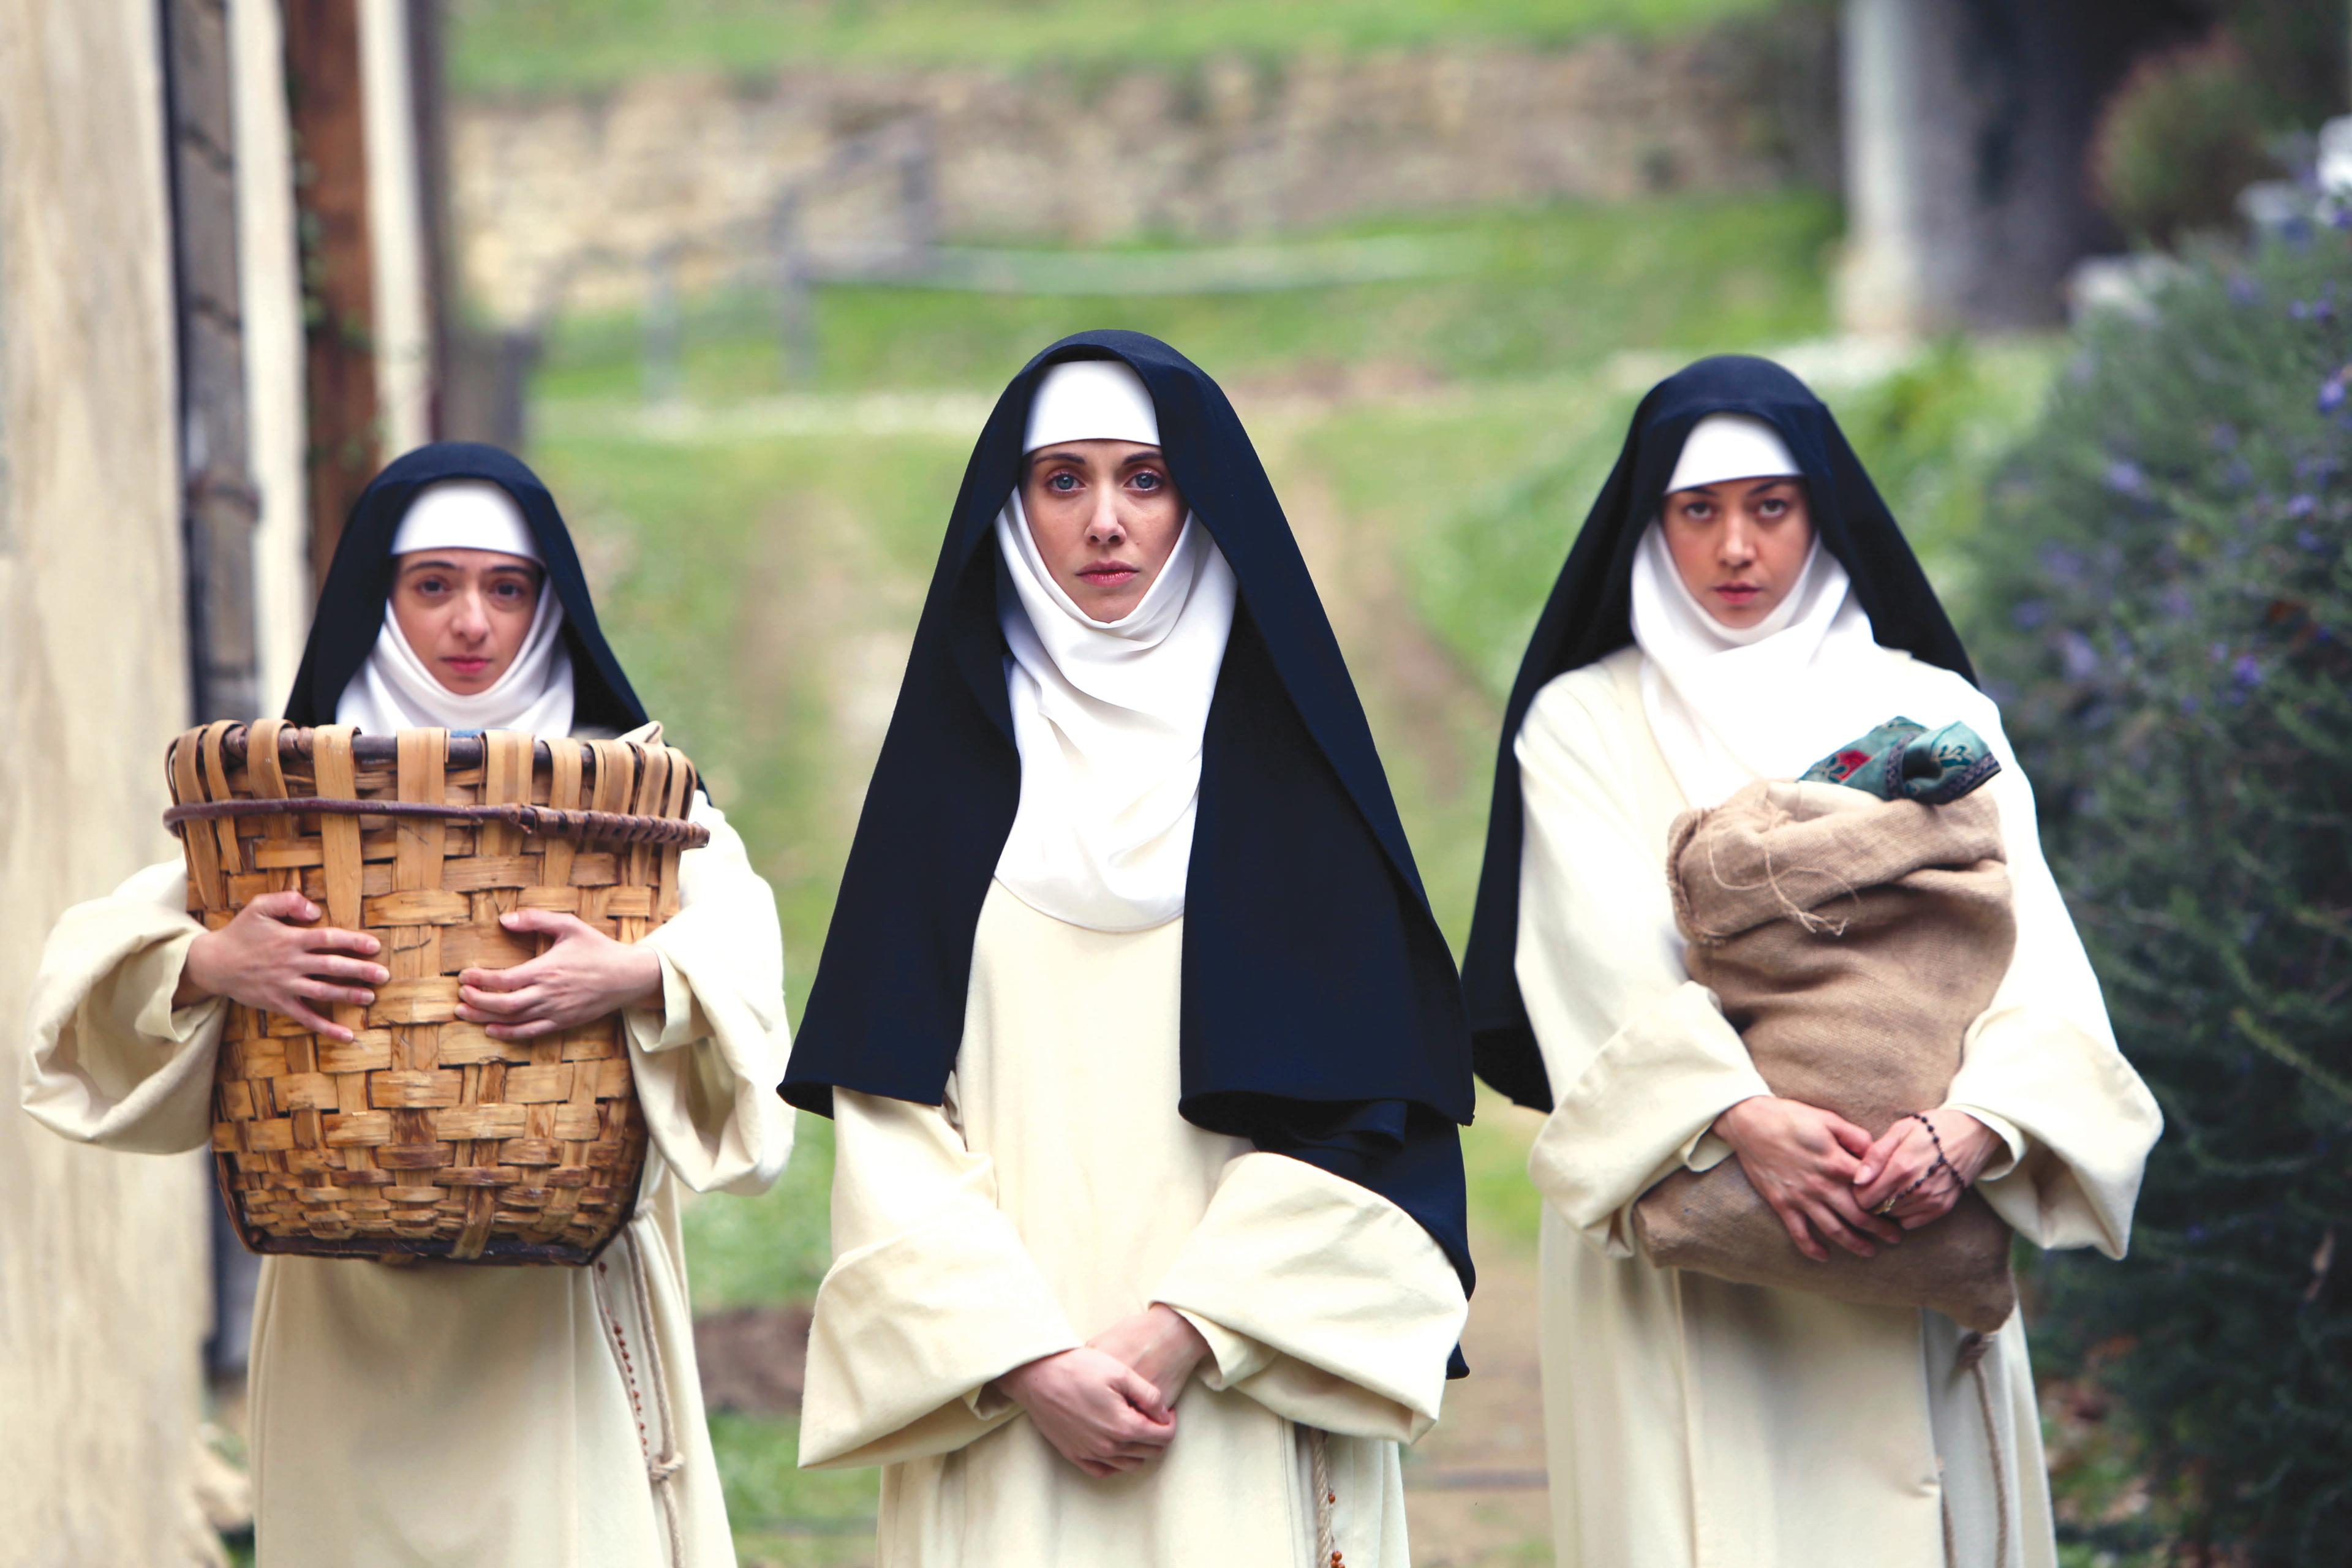 catholic nuns moving beyound the stereotypes essay